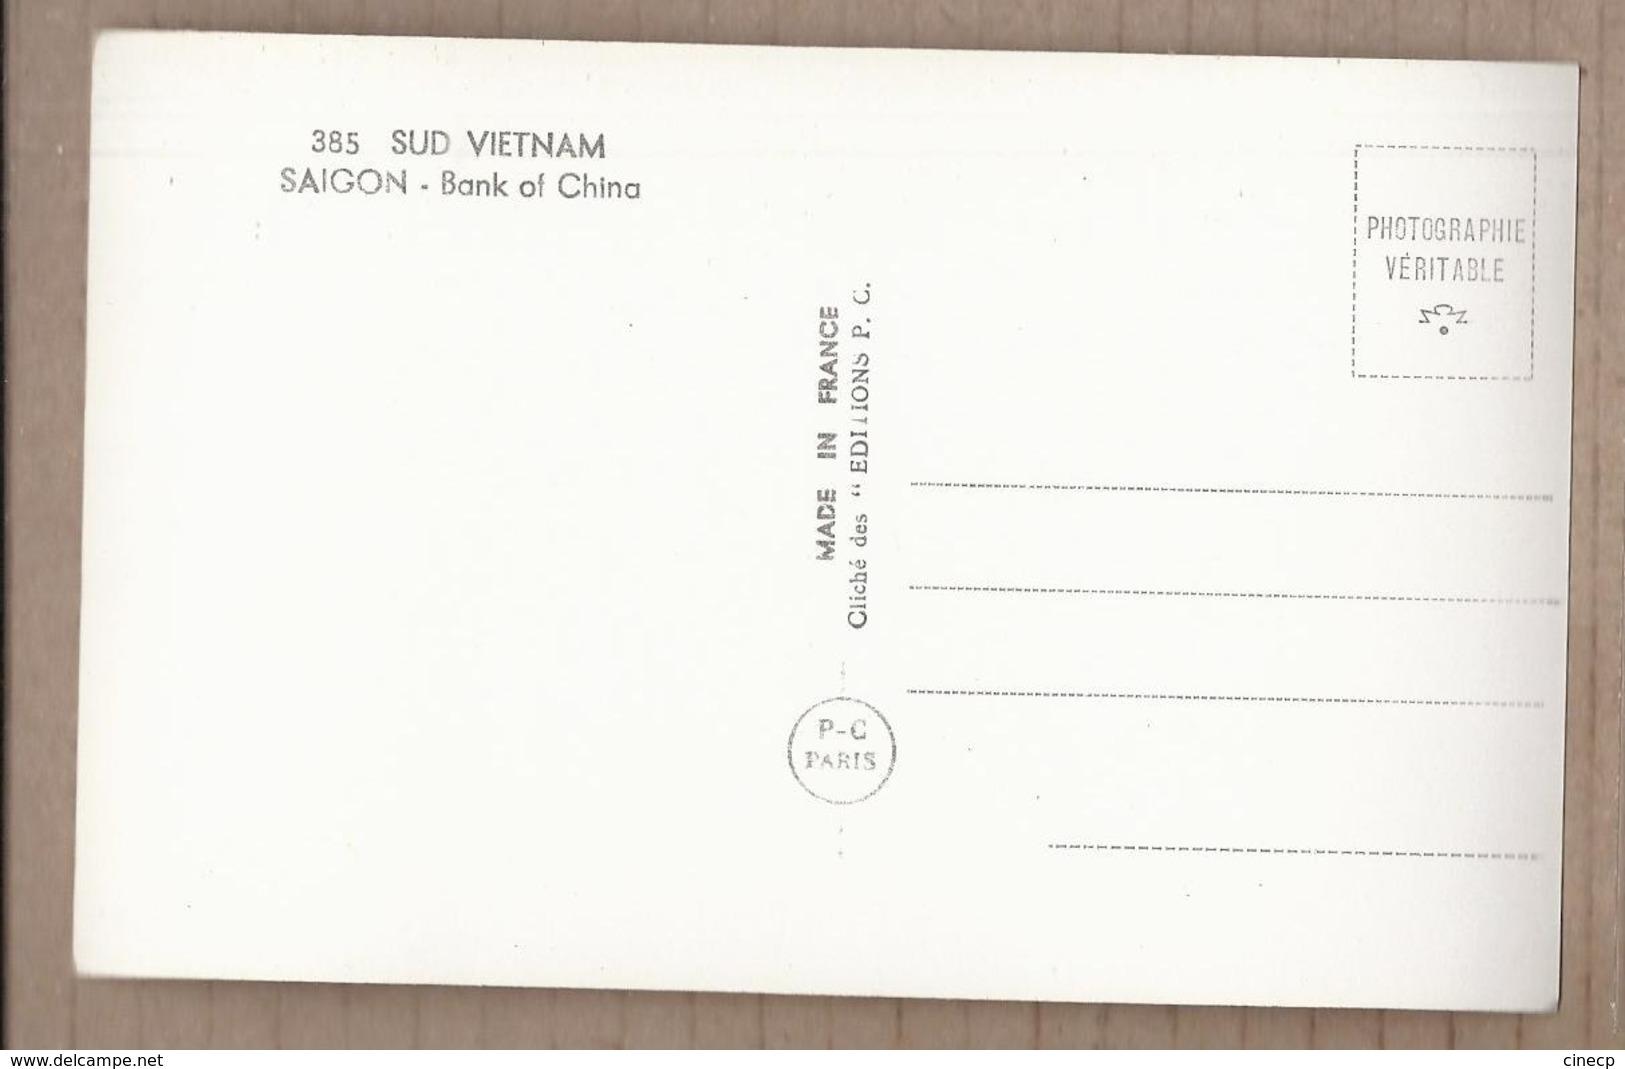 CPSM VIETNAM - INDOCHINE - SUD VIETNAM SAIGON - Bank Of China - CHINE - TB PLAN BANQUE ANIMATION - Viêt-Nam